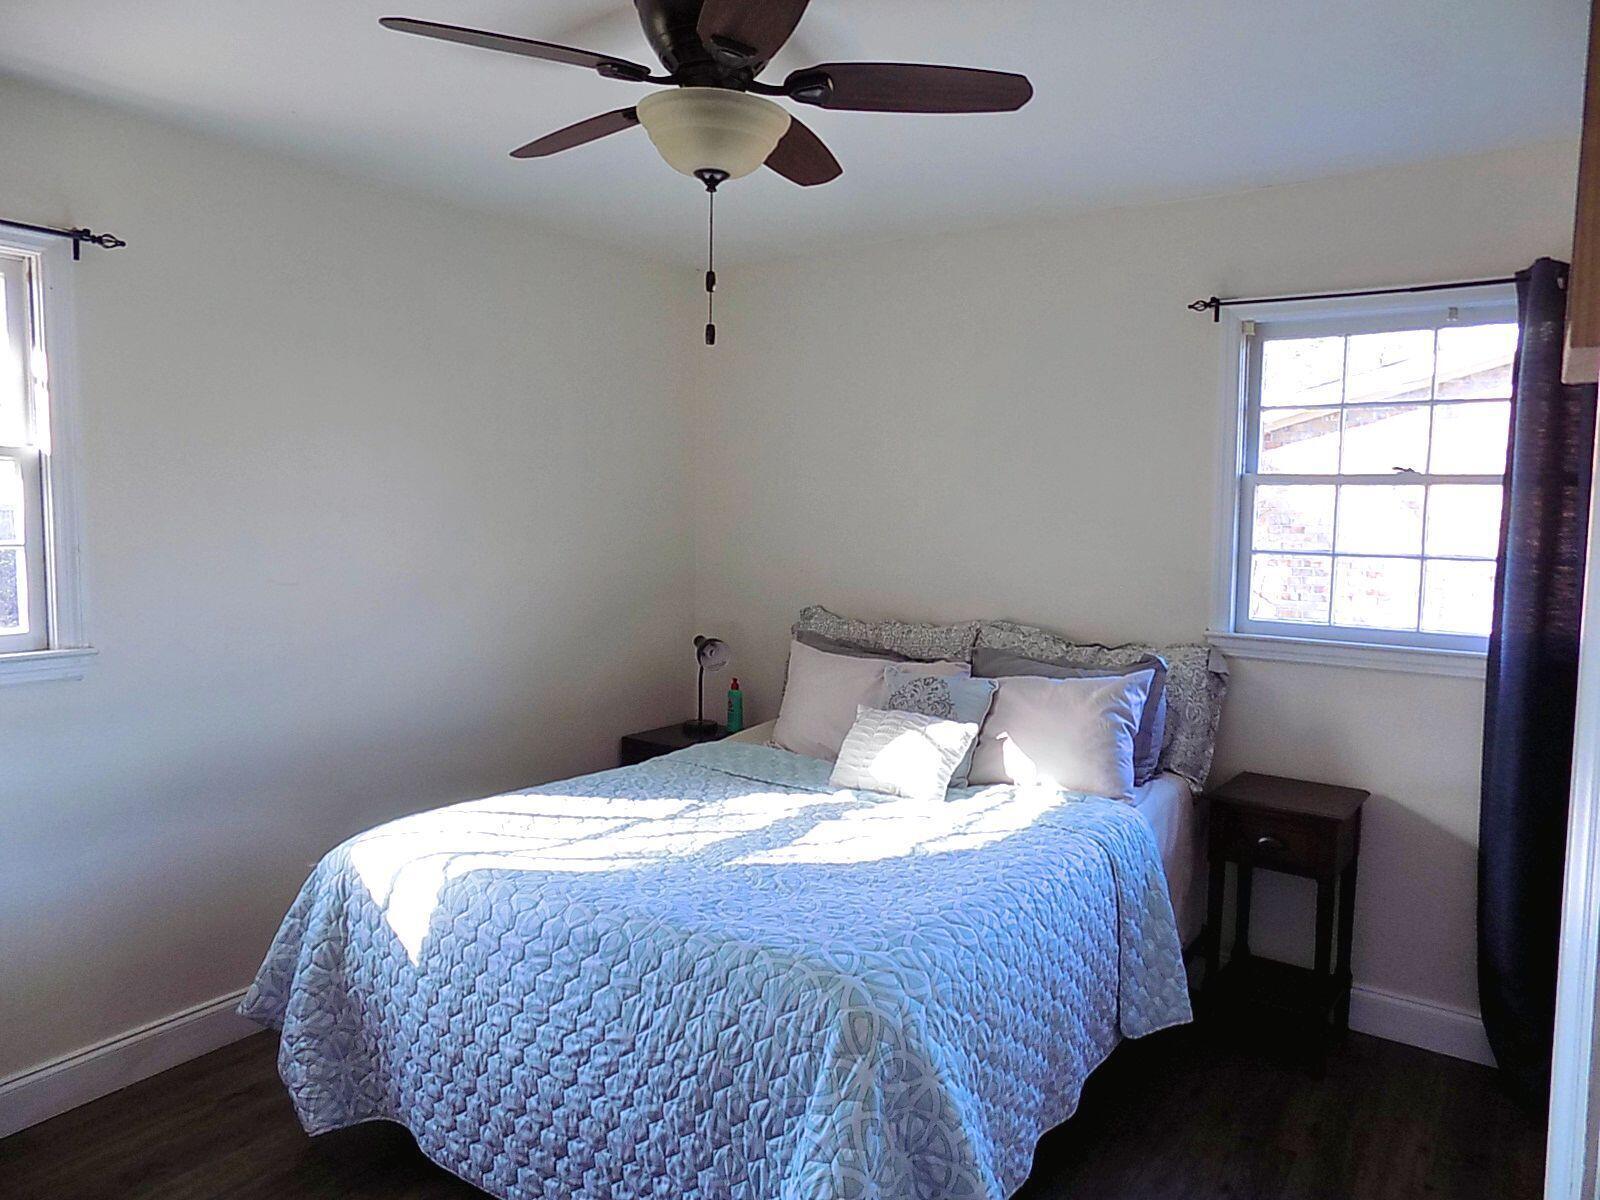 West Ashley Plantation Homes For Sale - 1720 Boone Hall, Charleston, SC - 12